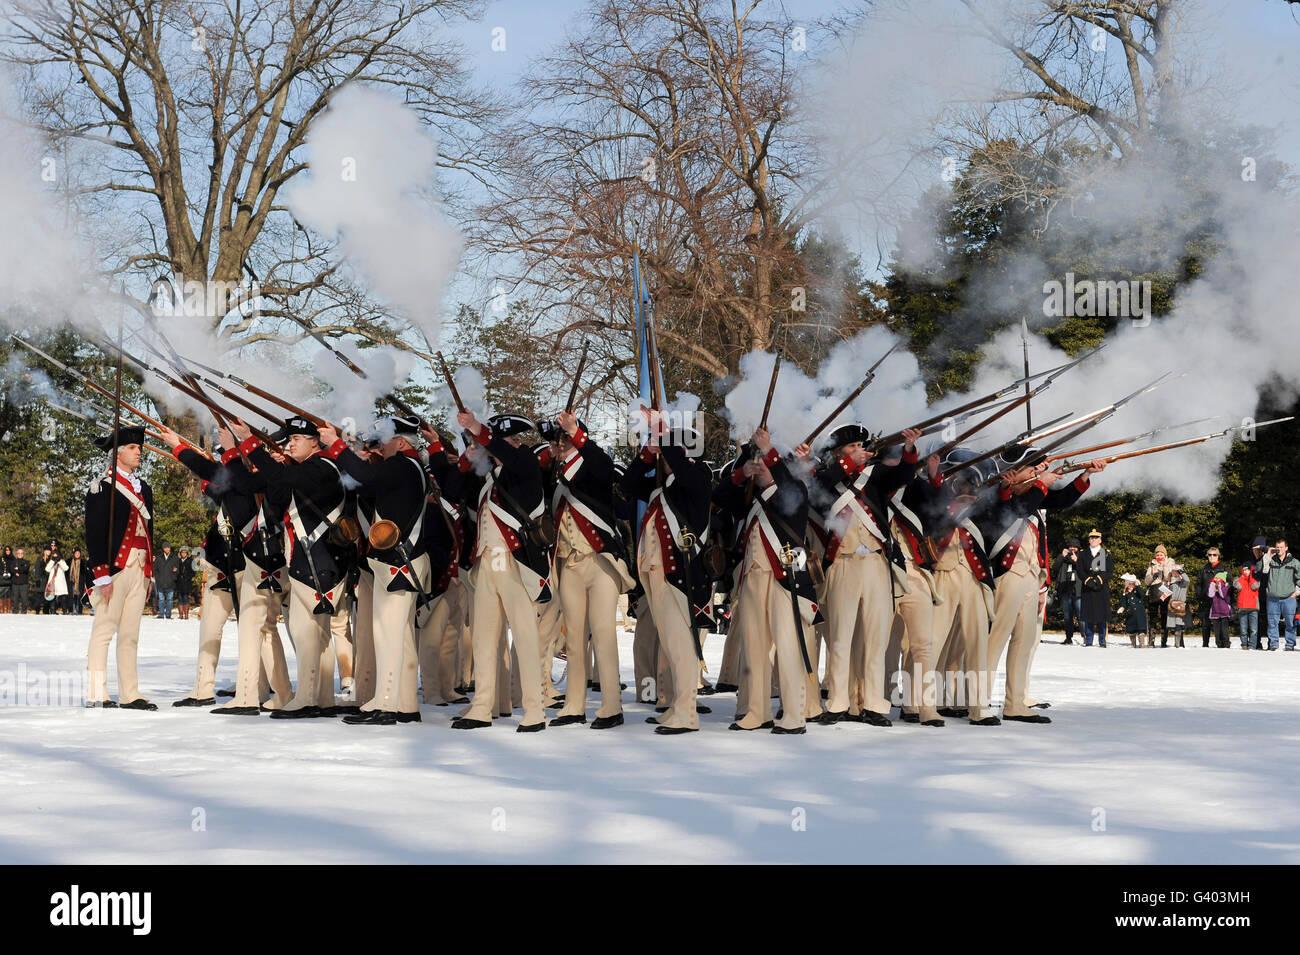 Reenactment of the Revolutionary War battle tactics and customs. - Stock Image